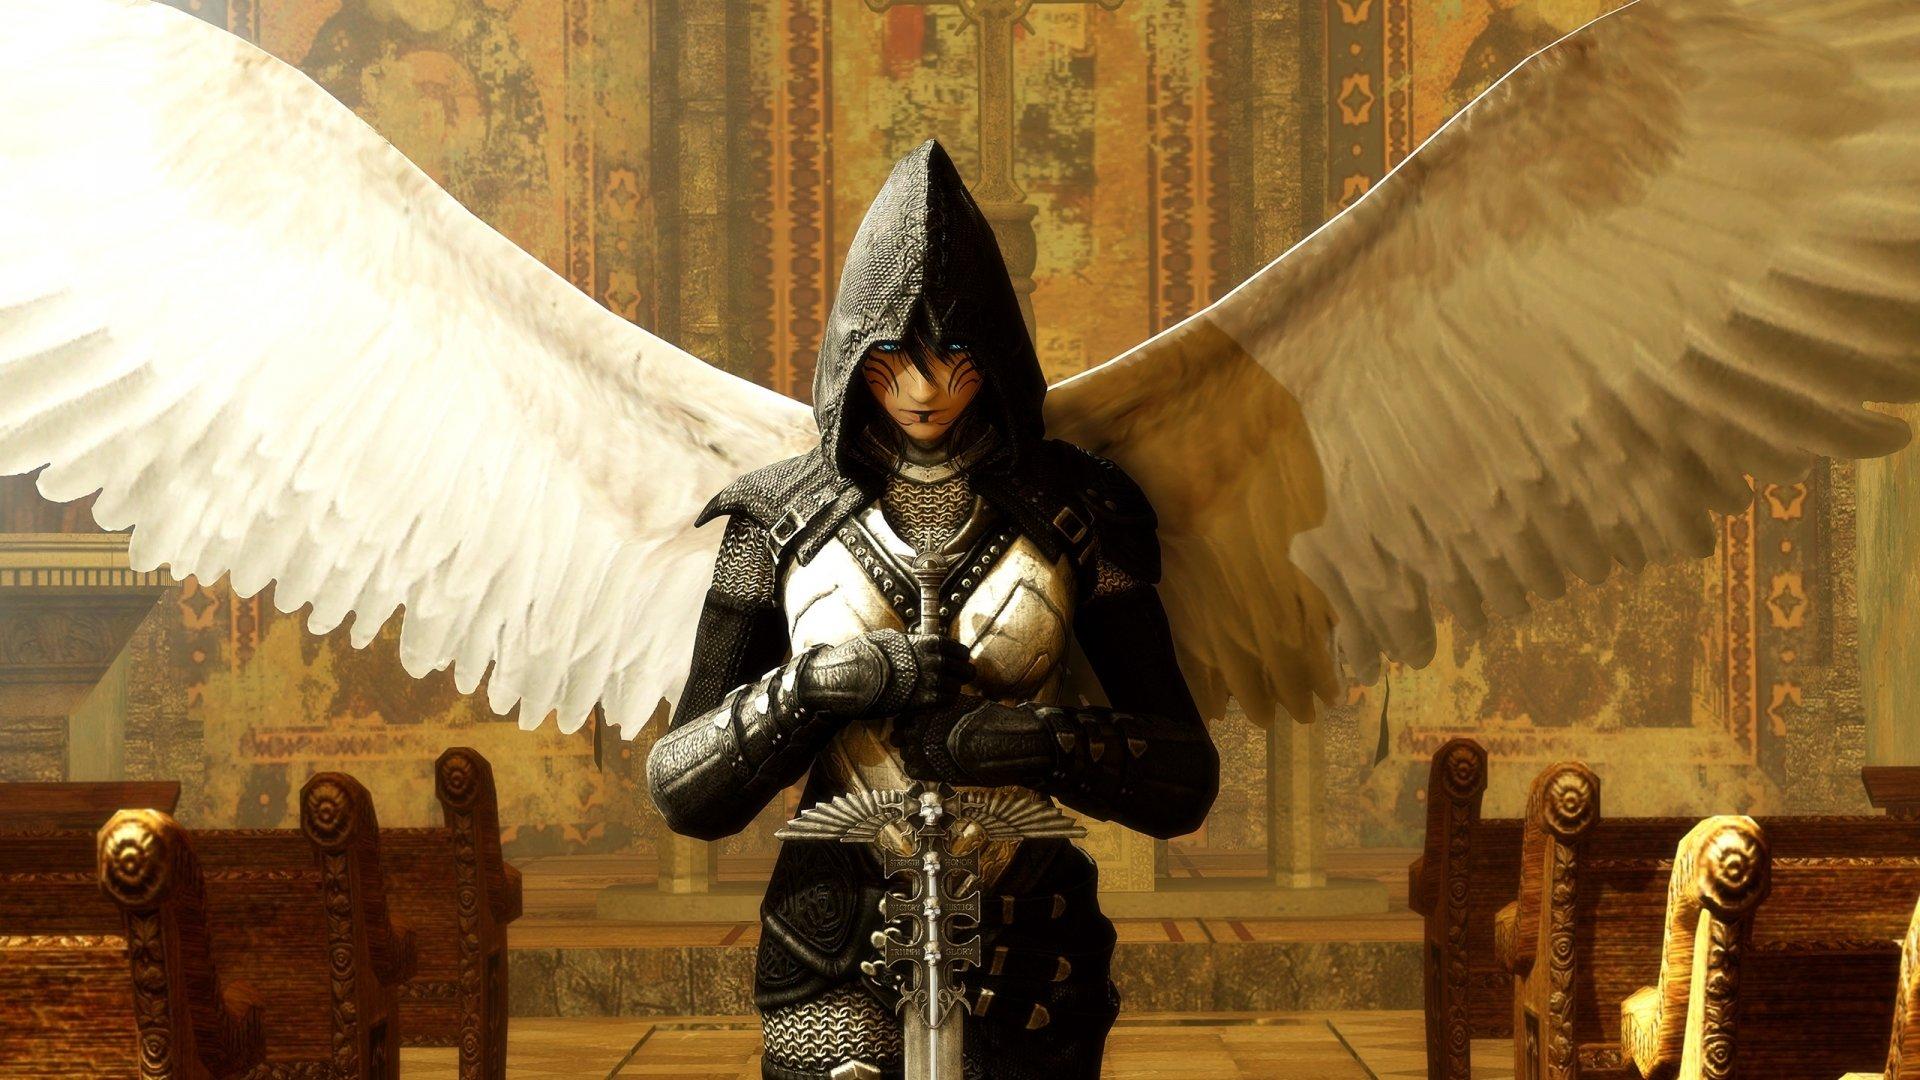 download full hd 1920x1080 angel warrior desktop background id